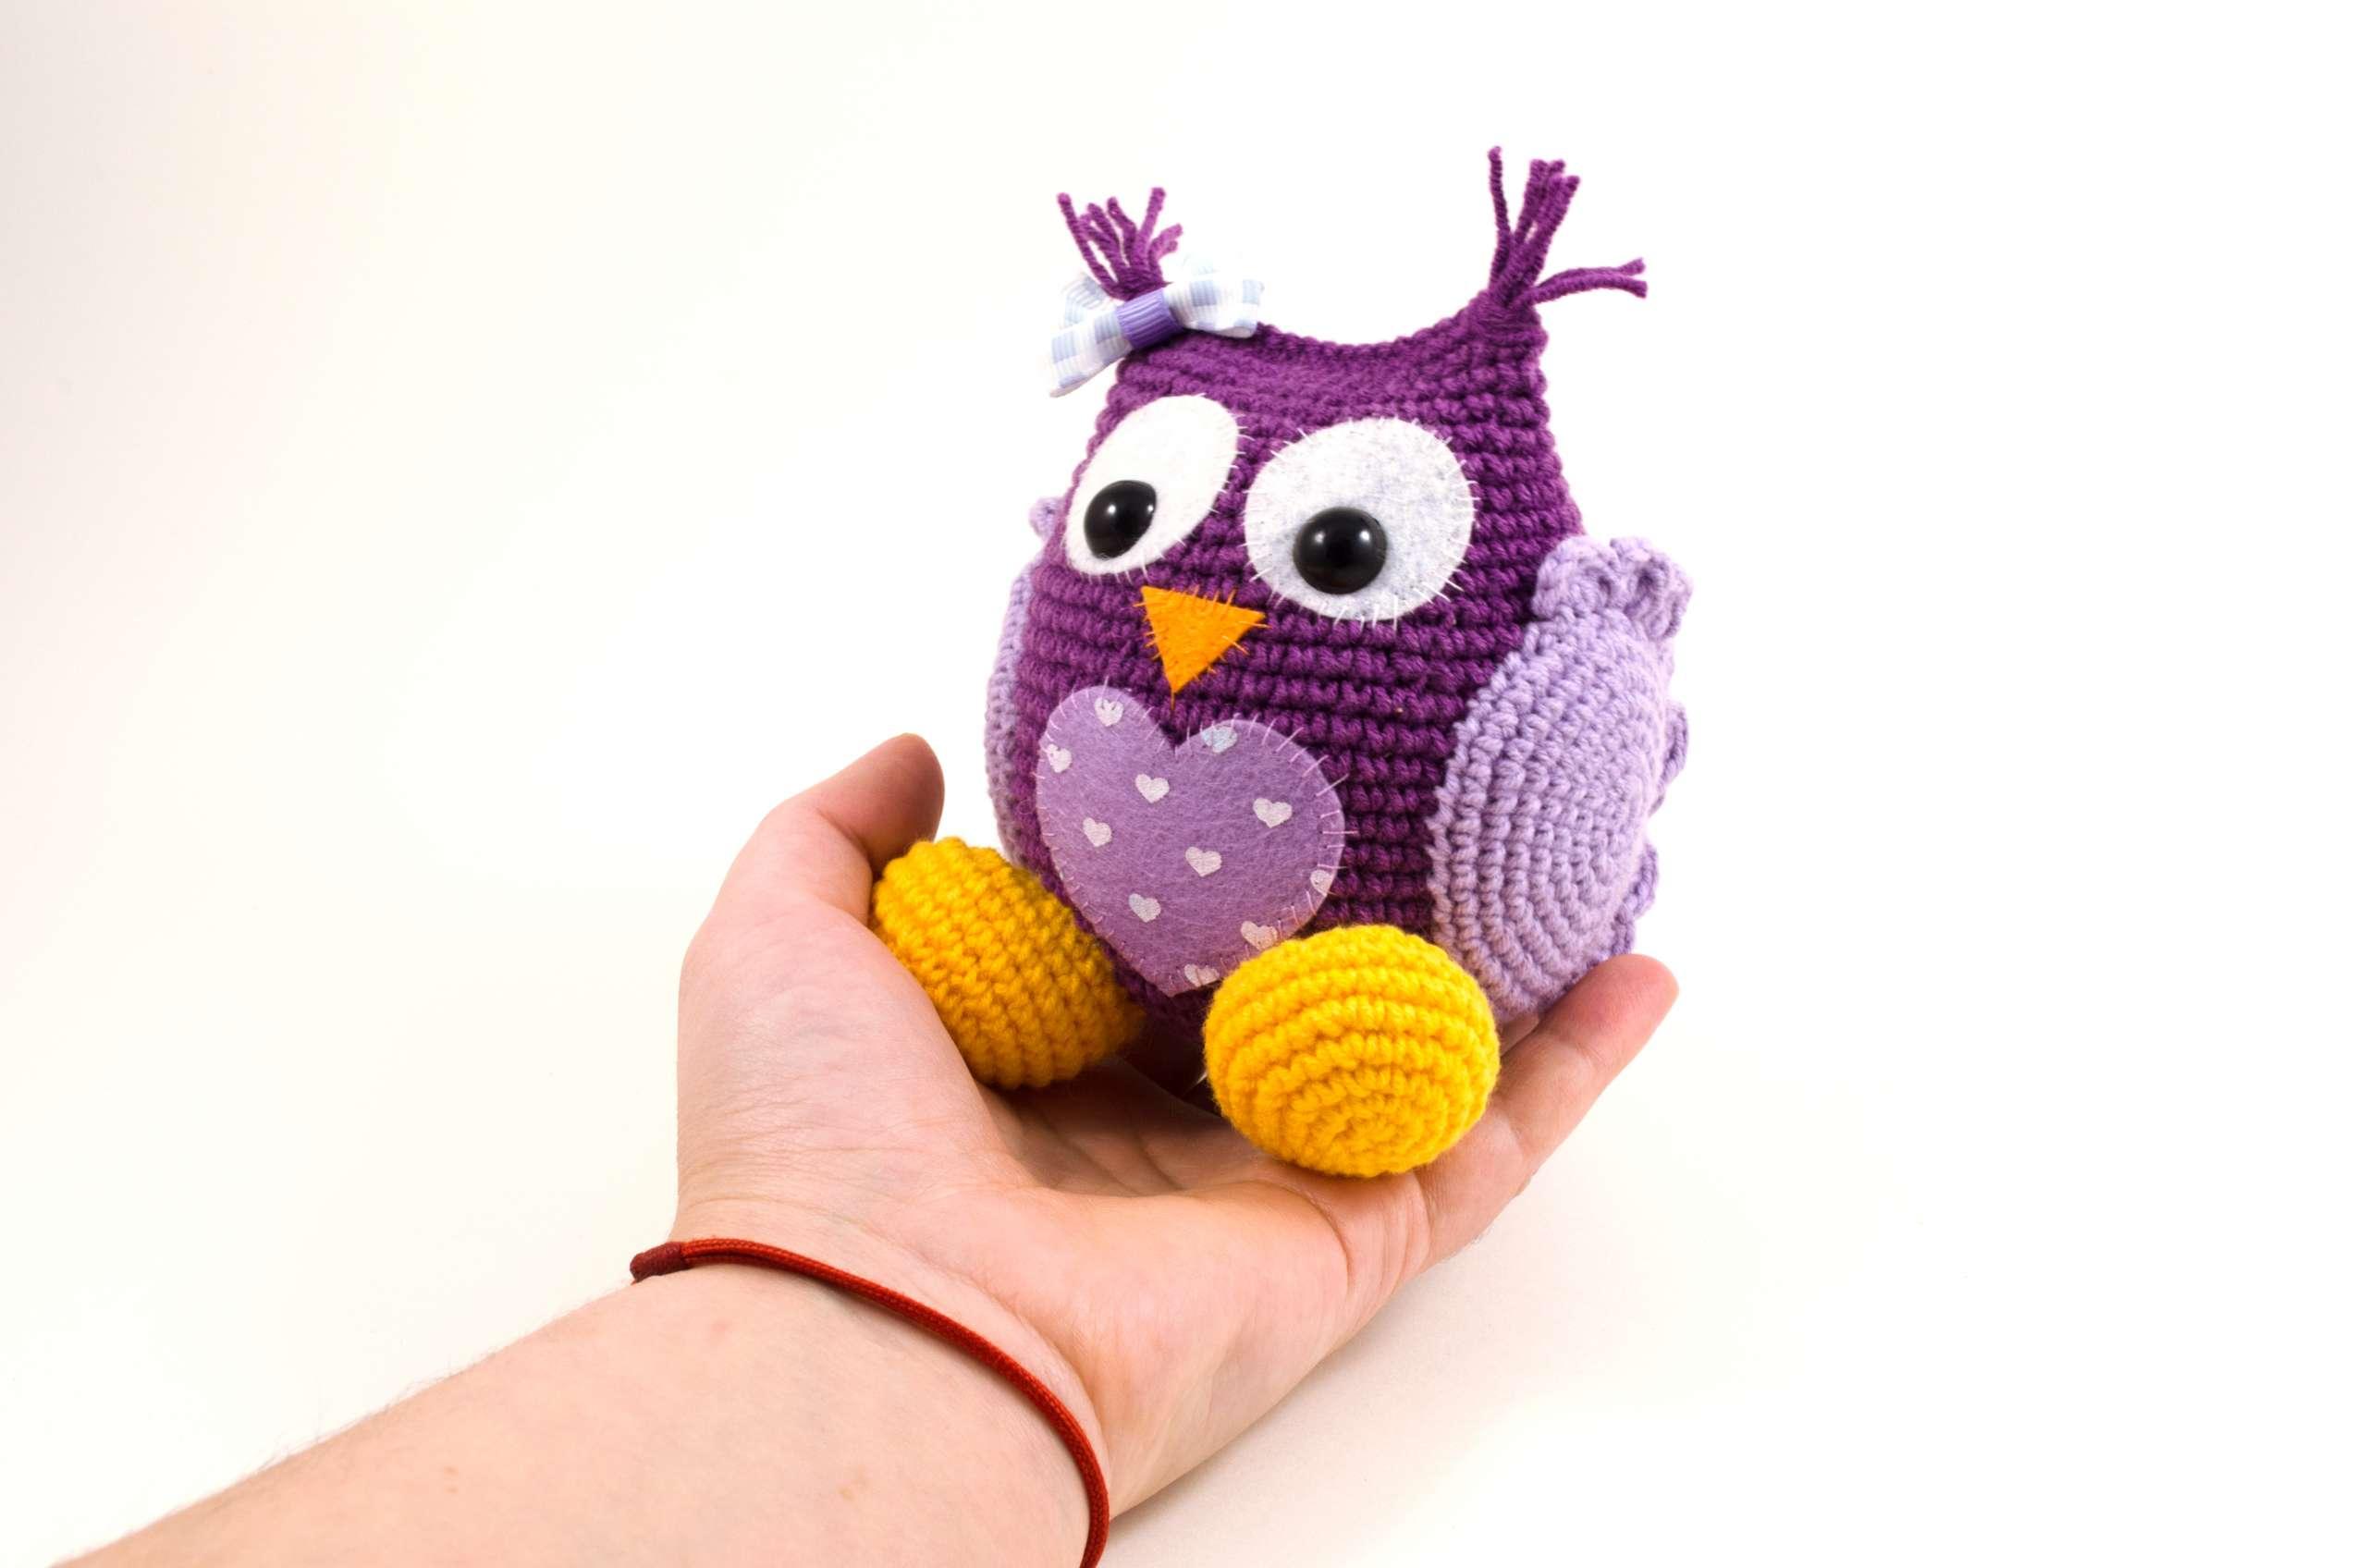 holding in hand crochet purple owl